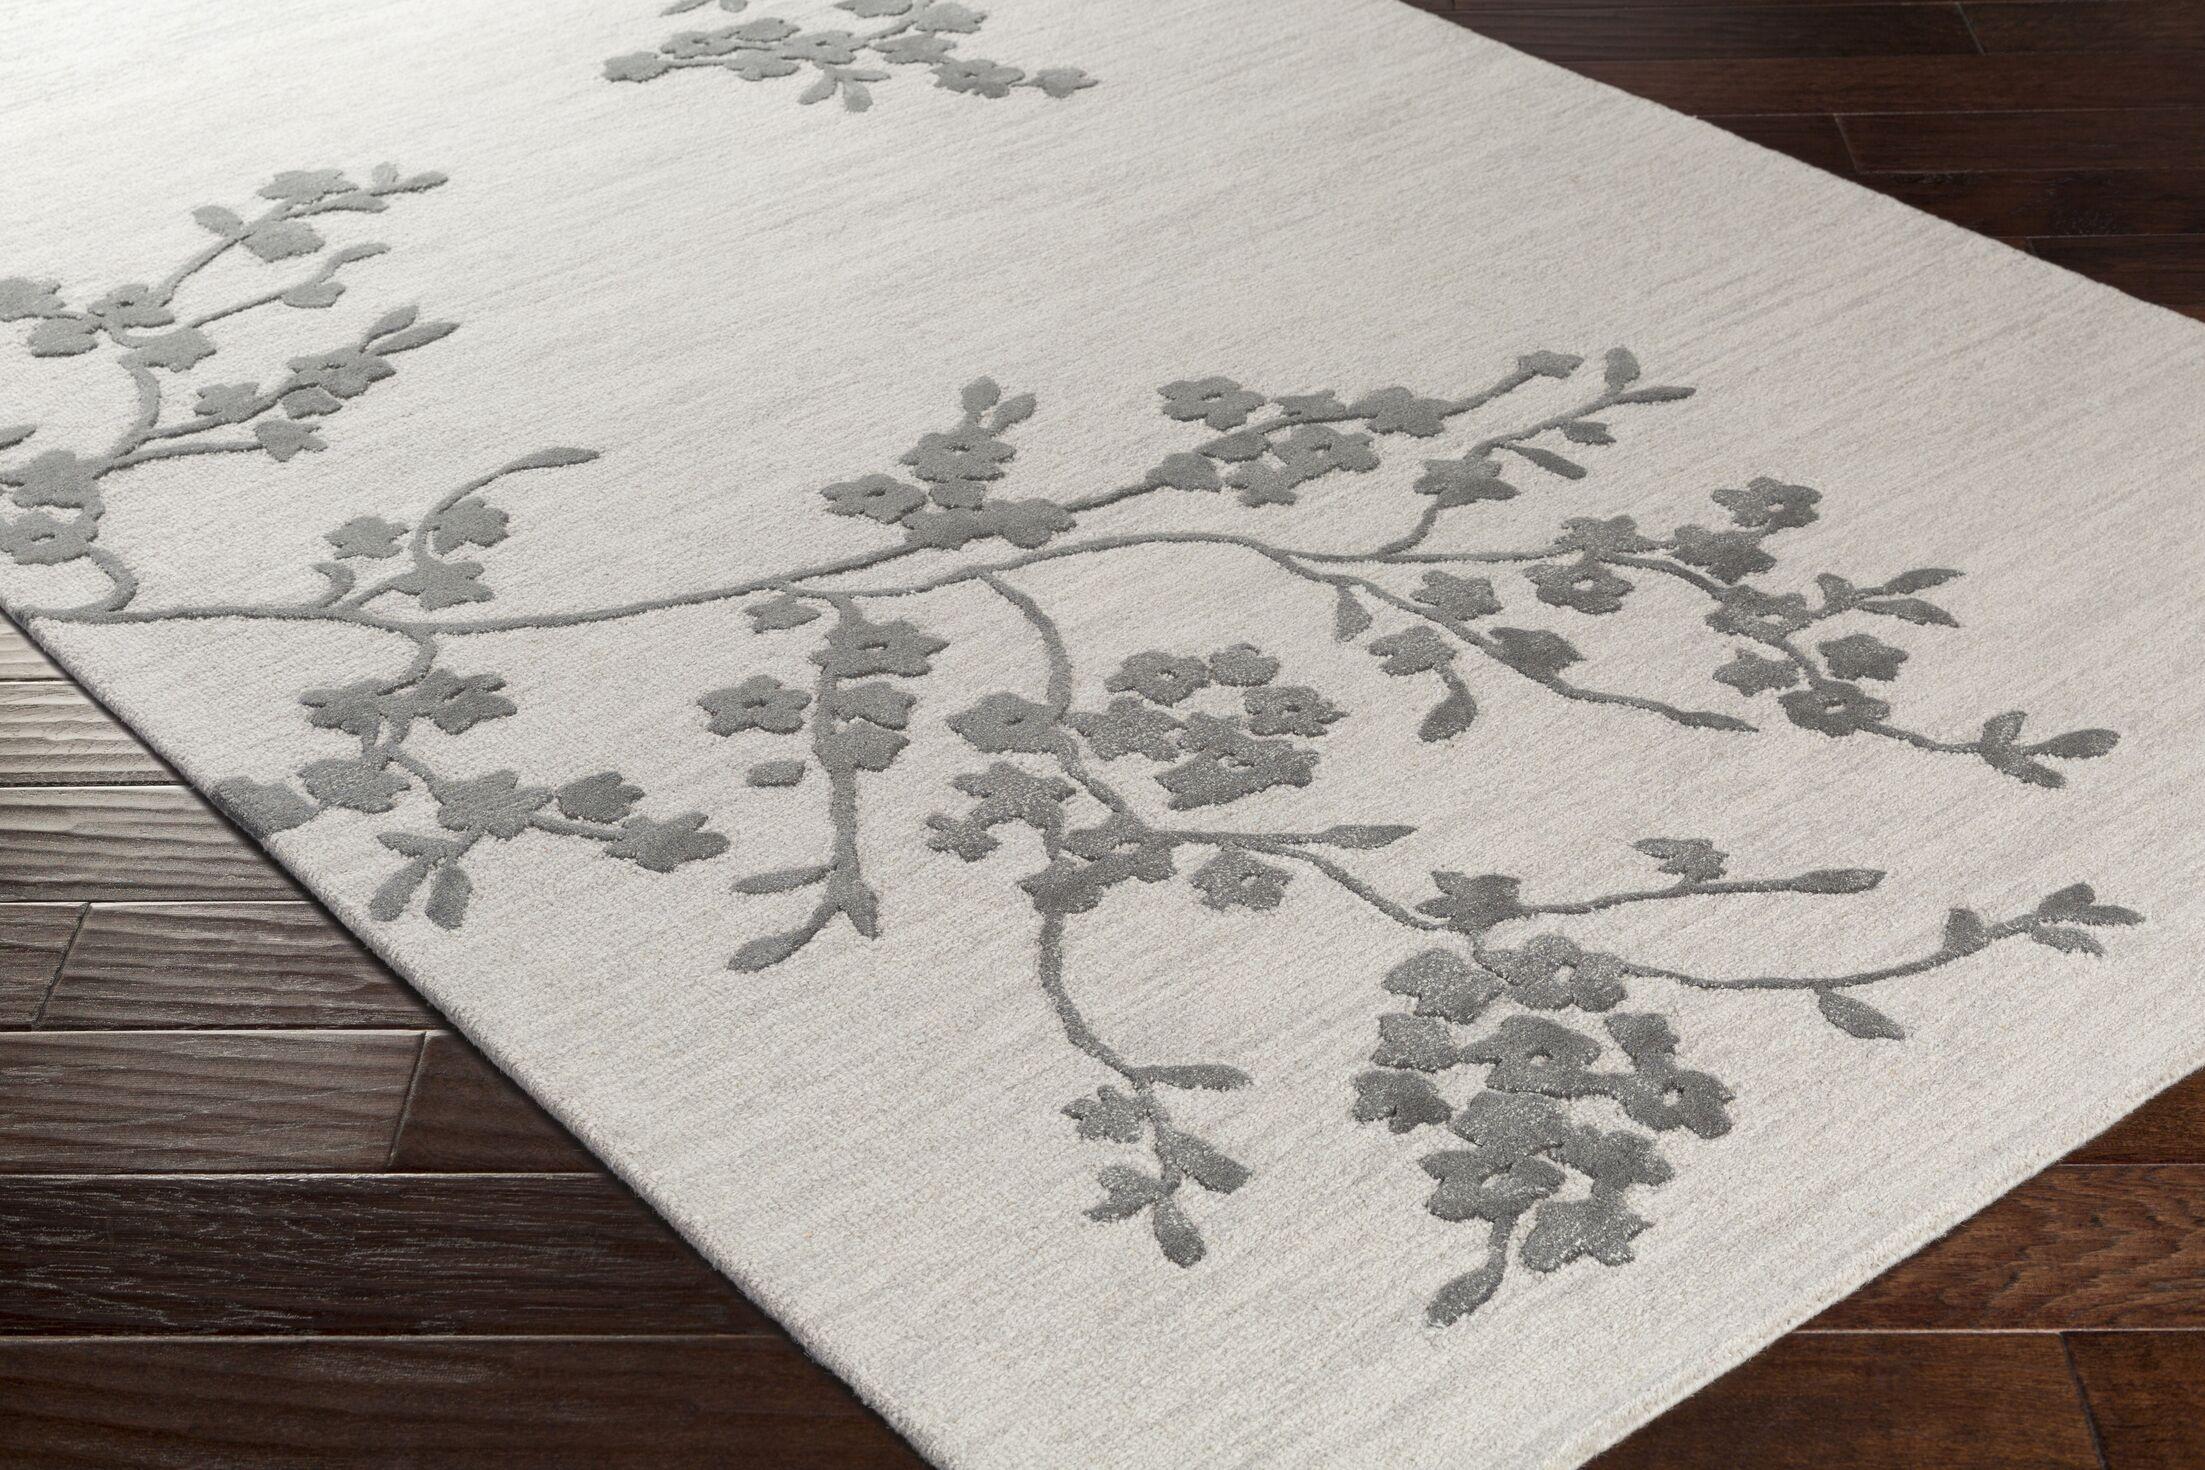 Kiely Hand-Tufted Light Gray/Charcoal Area Rug Rug Size: Rectangle 5' x 8'